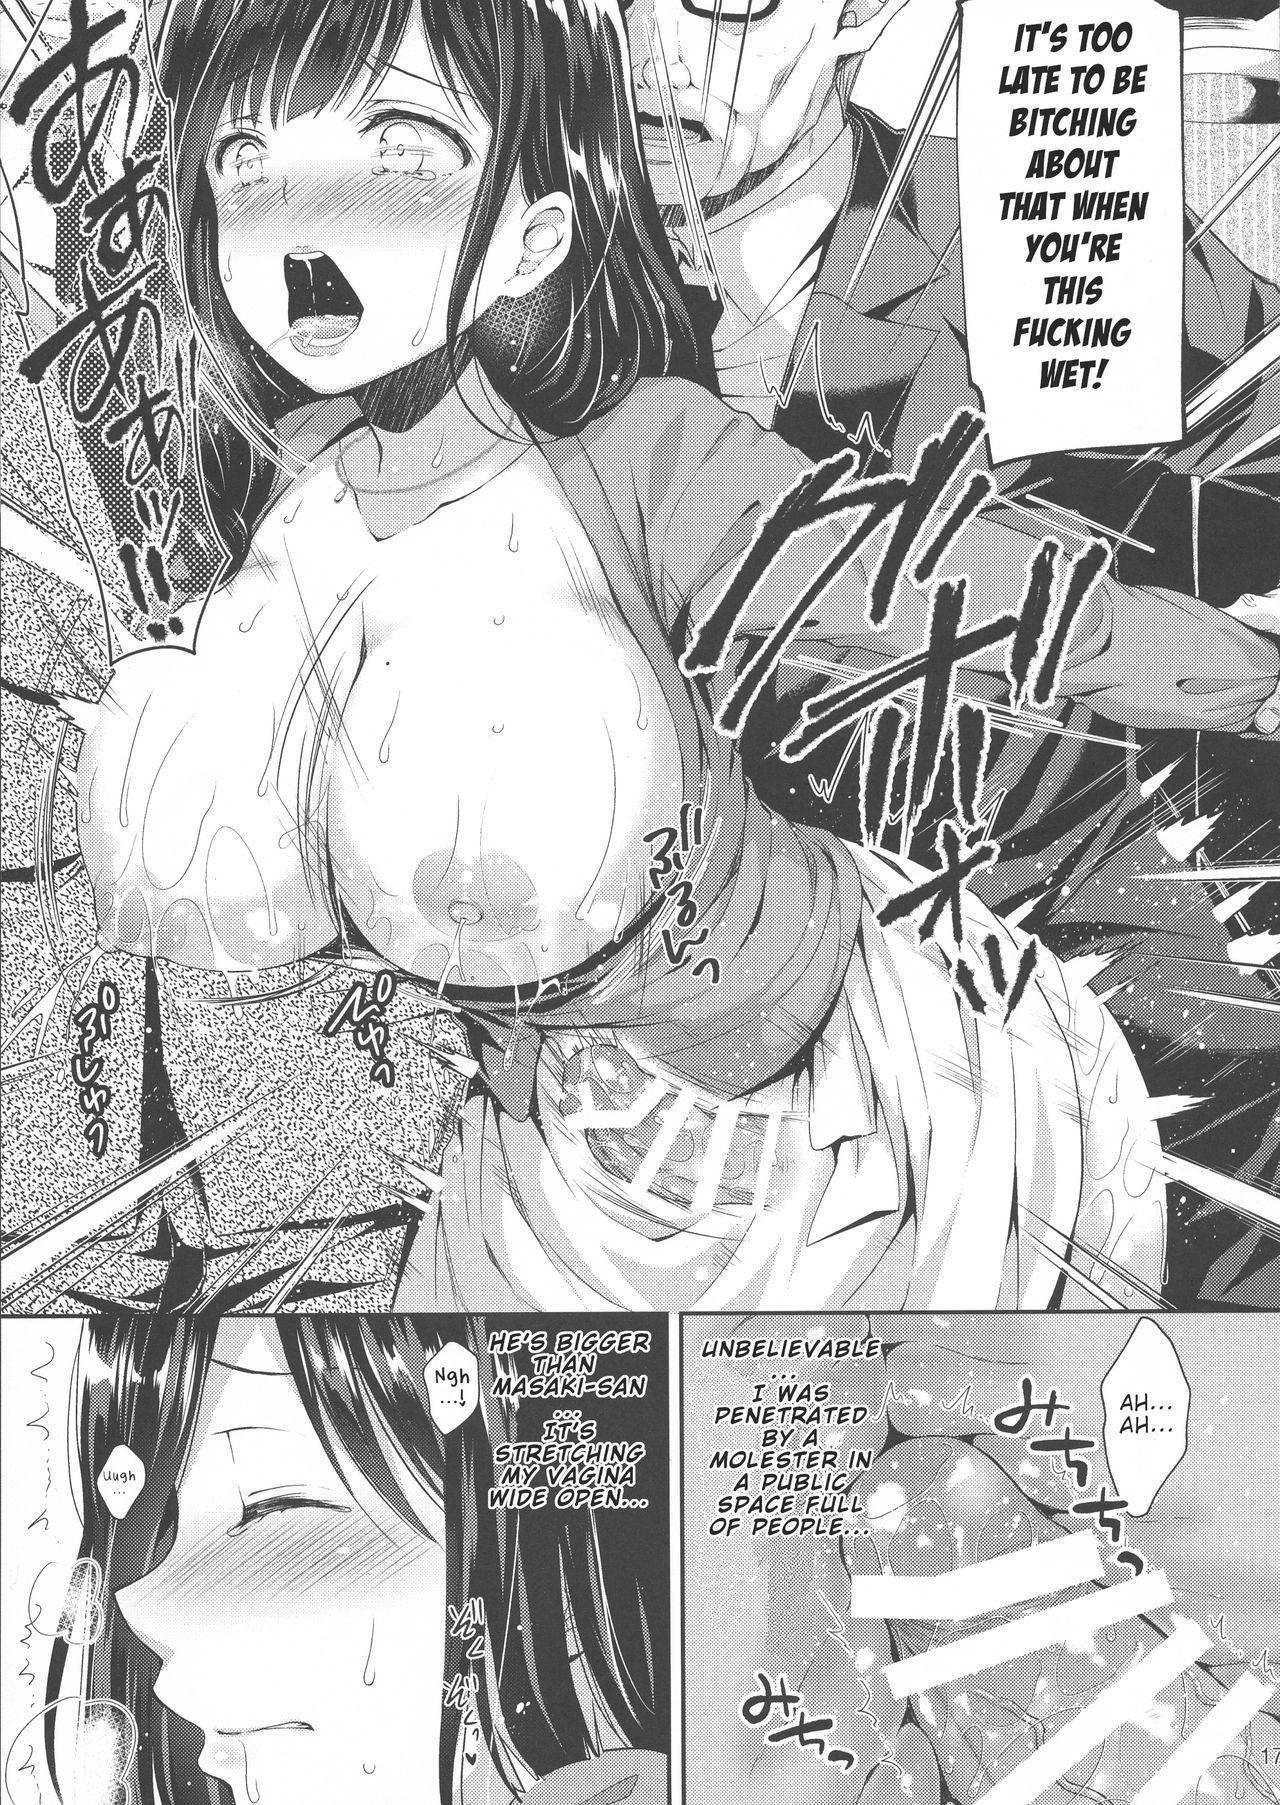 (C94) [Sugar*Berry*Syrup (Crowe)] Chijoku no Chikan Densha 3 ~ Hitozuma Shanai Kyousei Junyuu ~ | Shameless Train Molester 3 ~ Forcing a Married Woman to Breastfeed in the Train ~ [English] [The Chrysanthemum Translations] 16